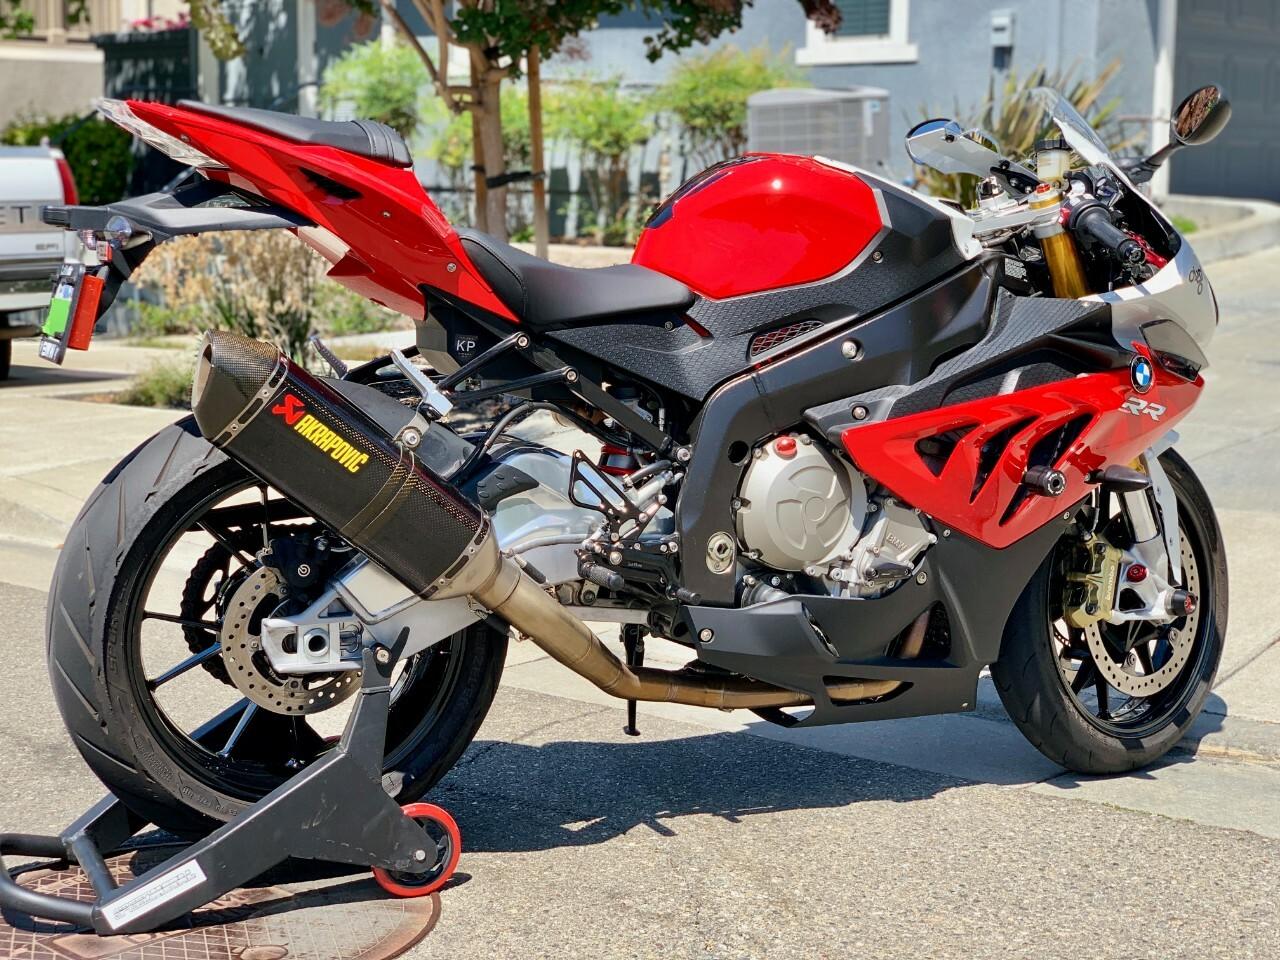 craigslist santa barbara motorcycles | Amatmotor.co